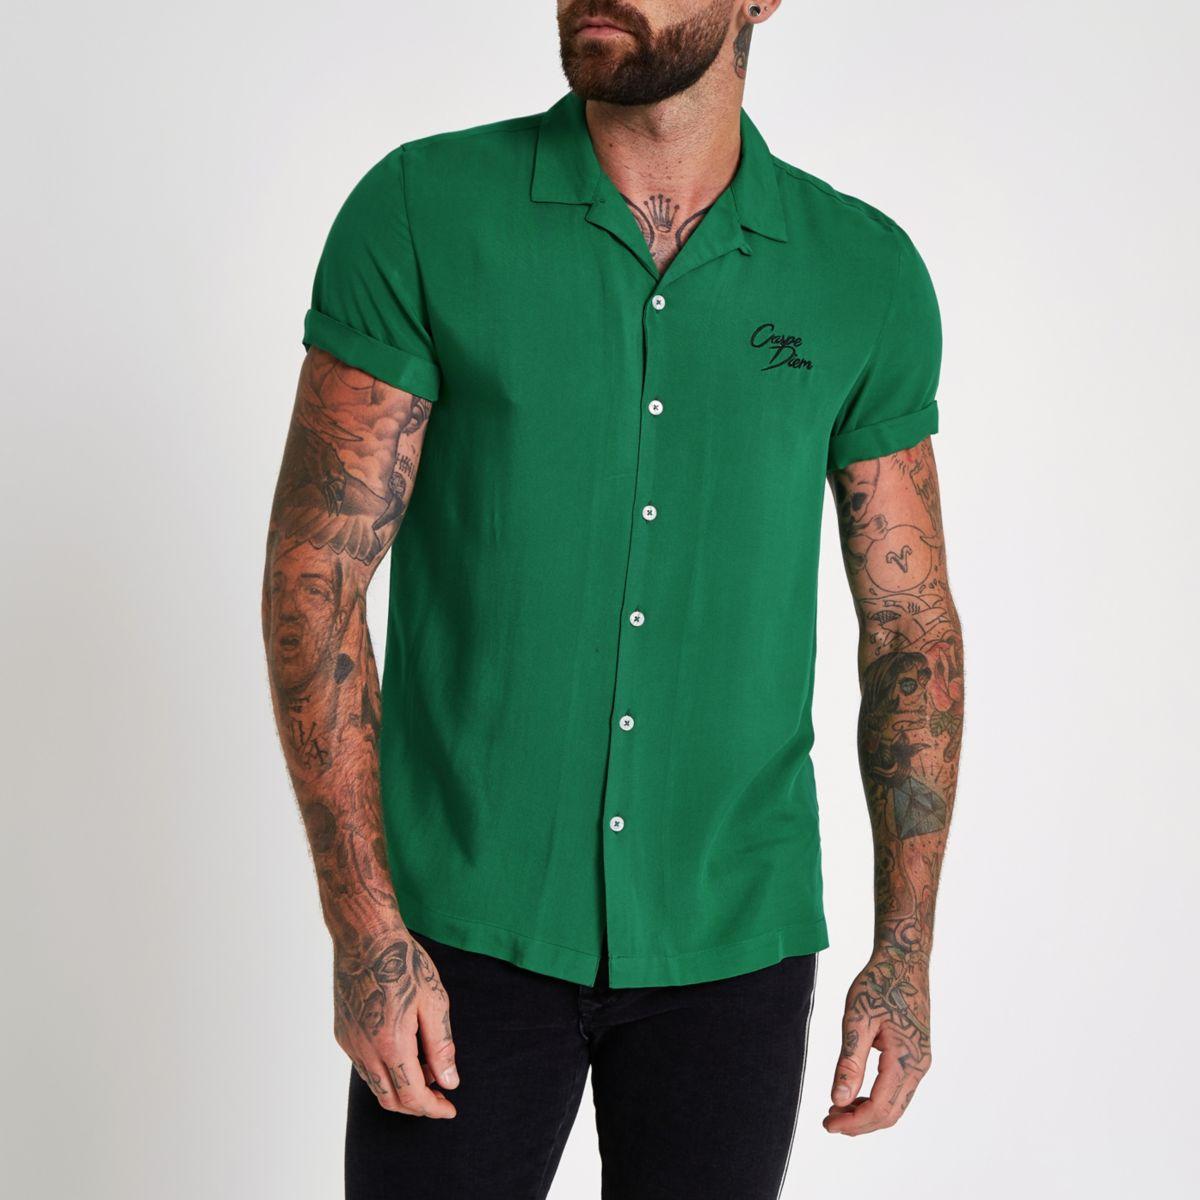 Green 'carpe diem' embroidered shirt